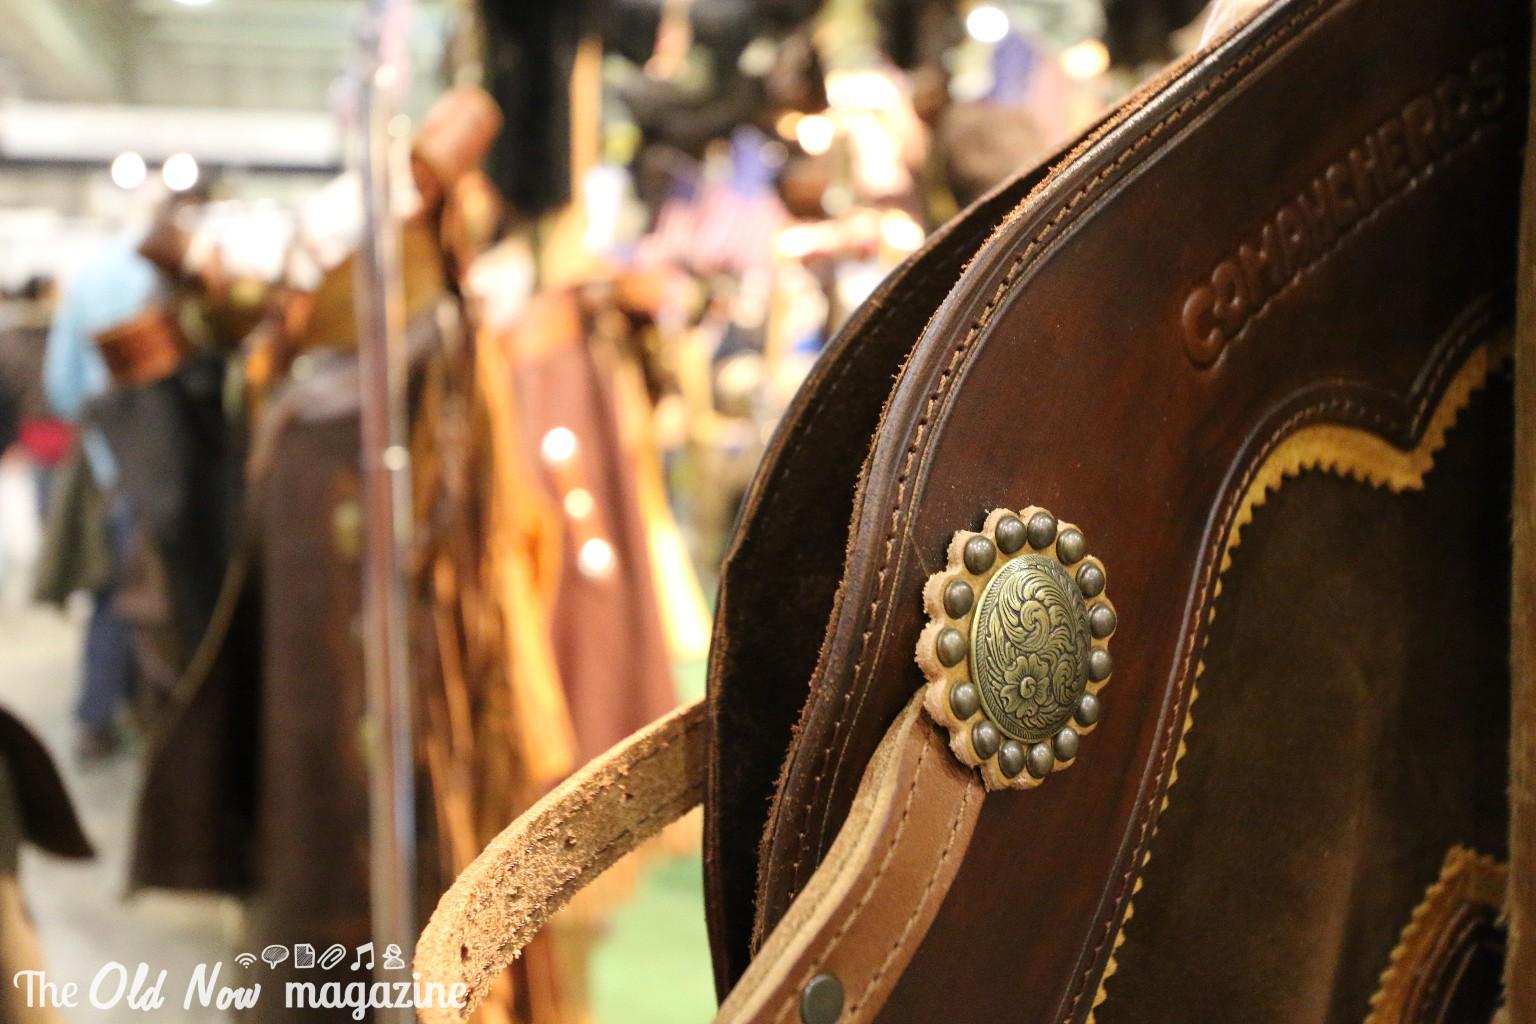 verona cavalli 2014 gmc - photo#29